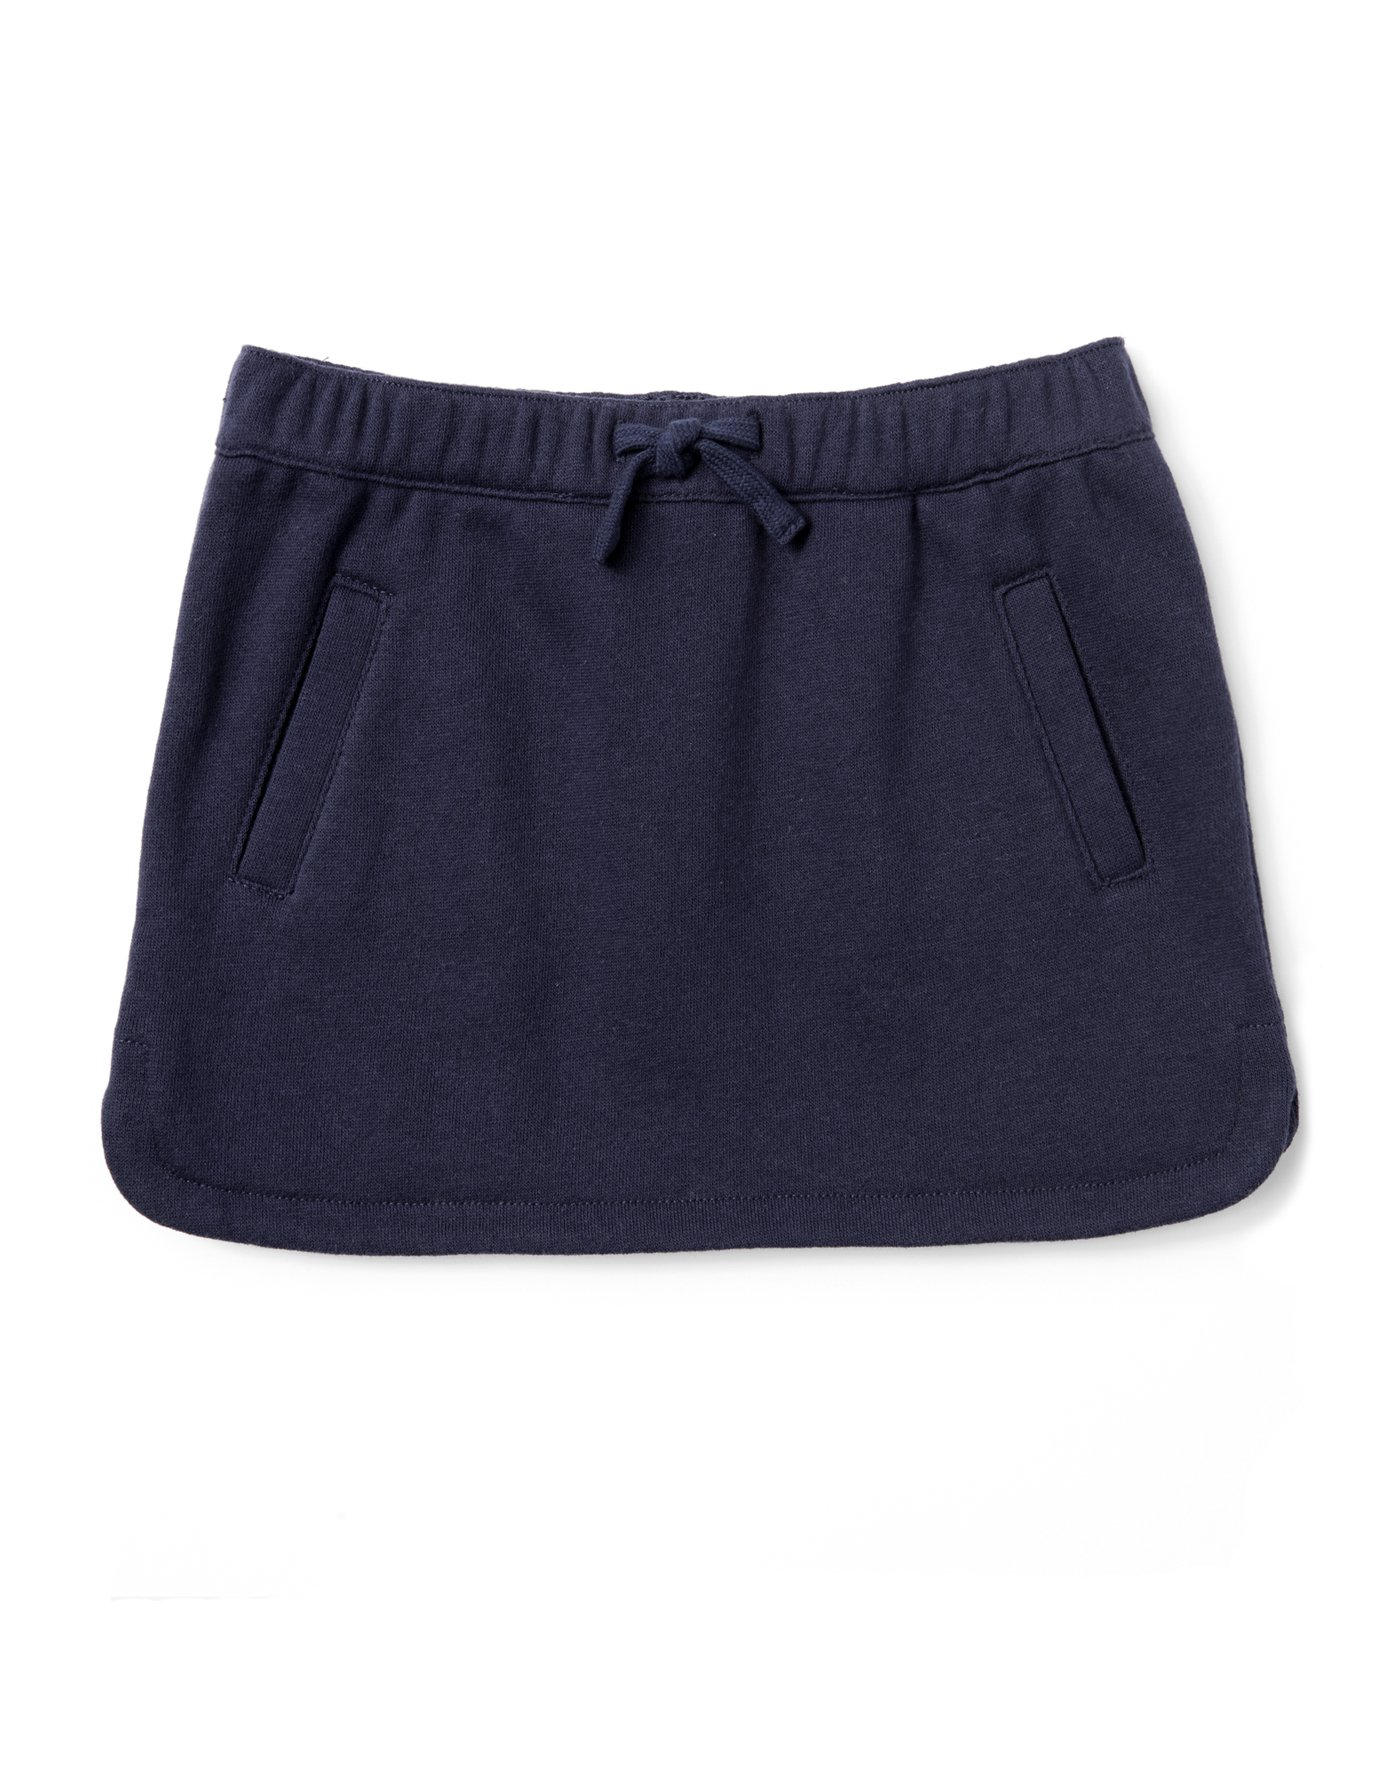 Gymboree Little Girls' Dolphin Skirt, Navy, M